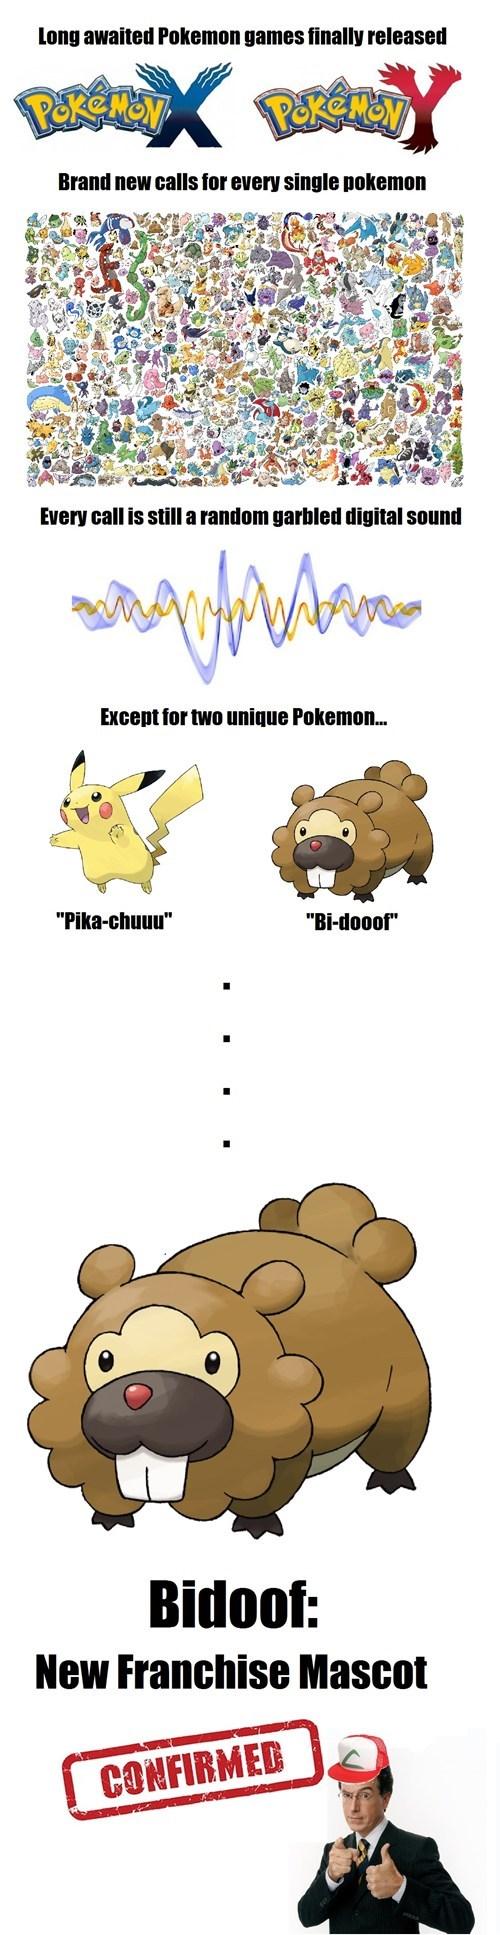 A big change to the main Pokemon franchise mascot?!?